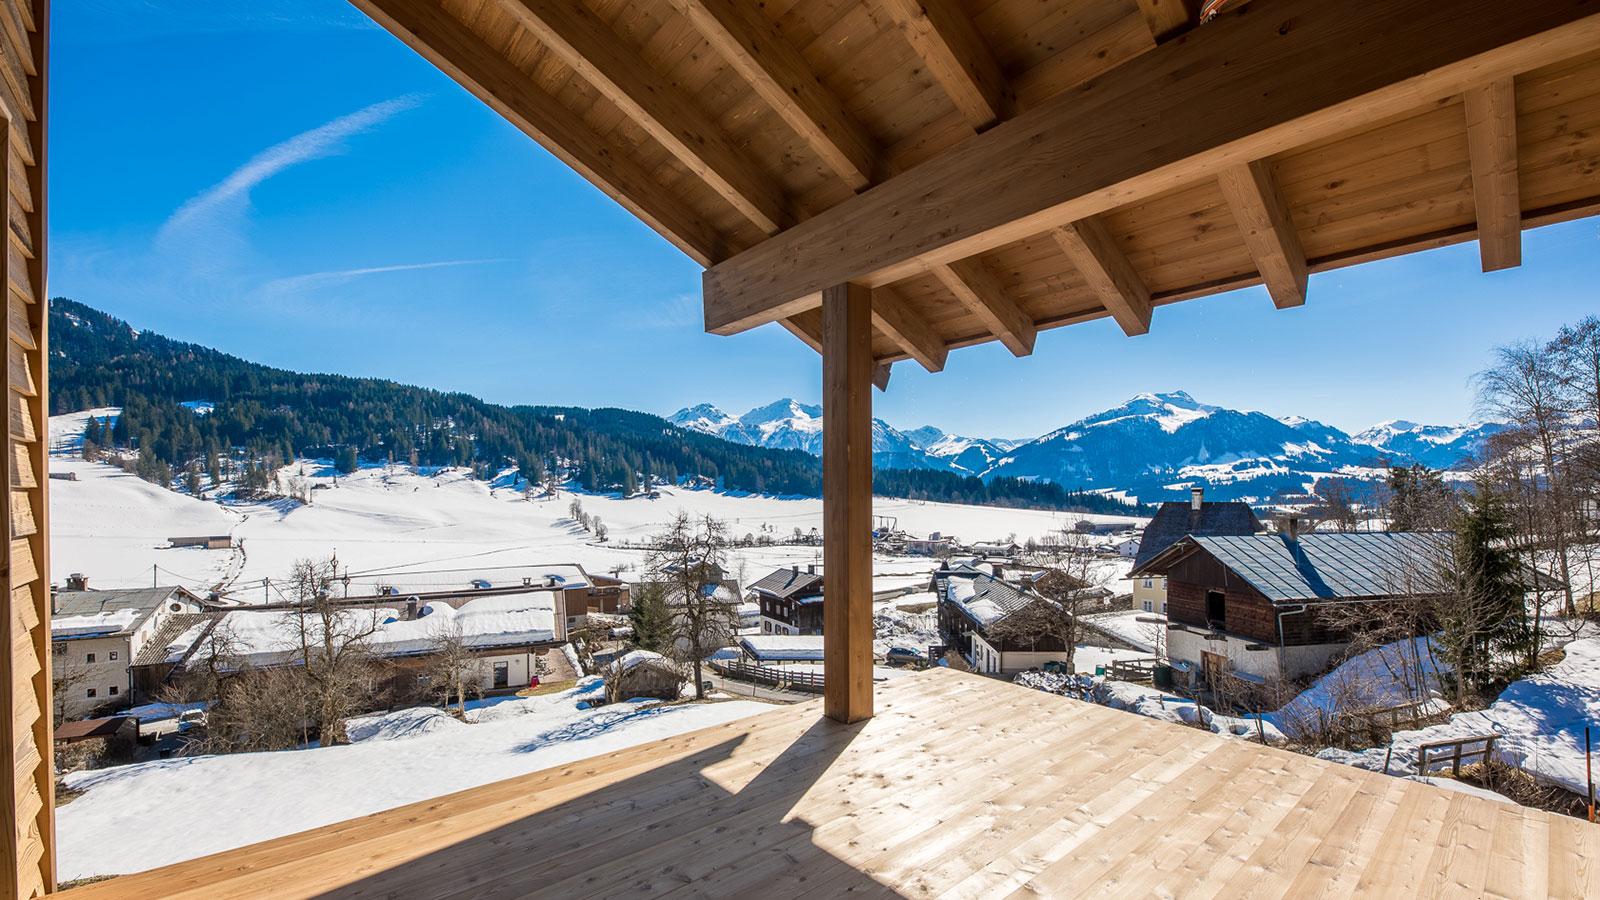 Haus Jakob Chalet, Austria